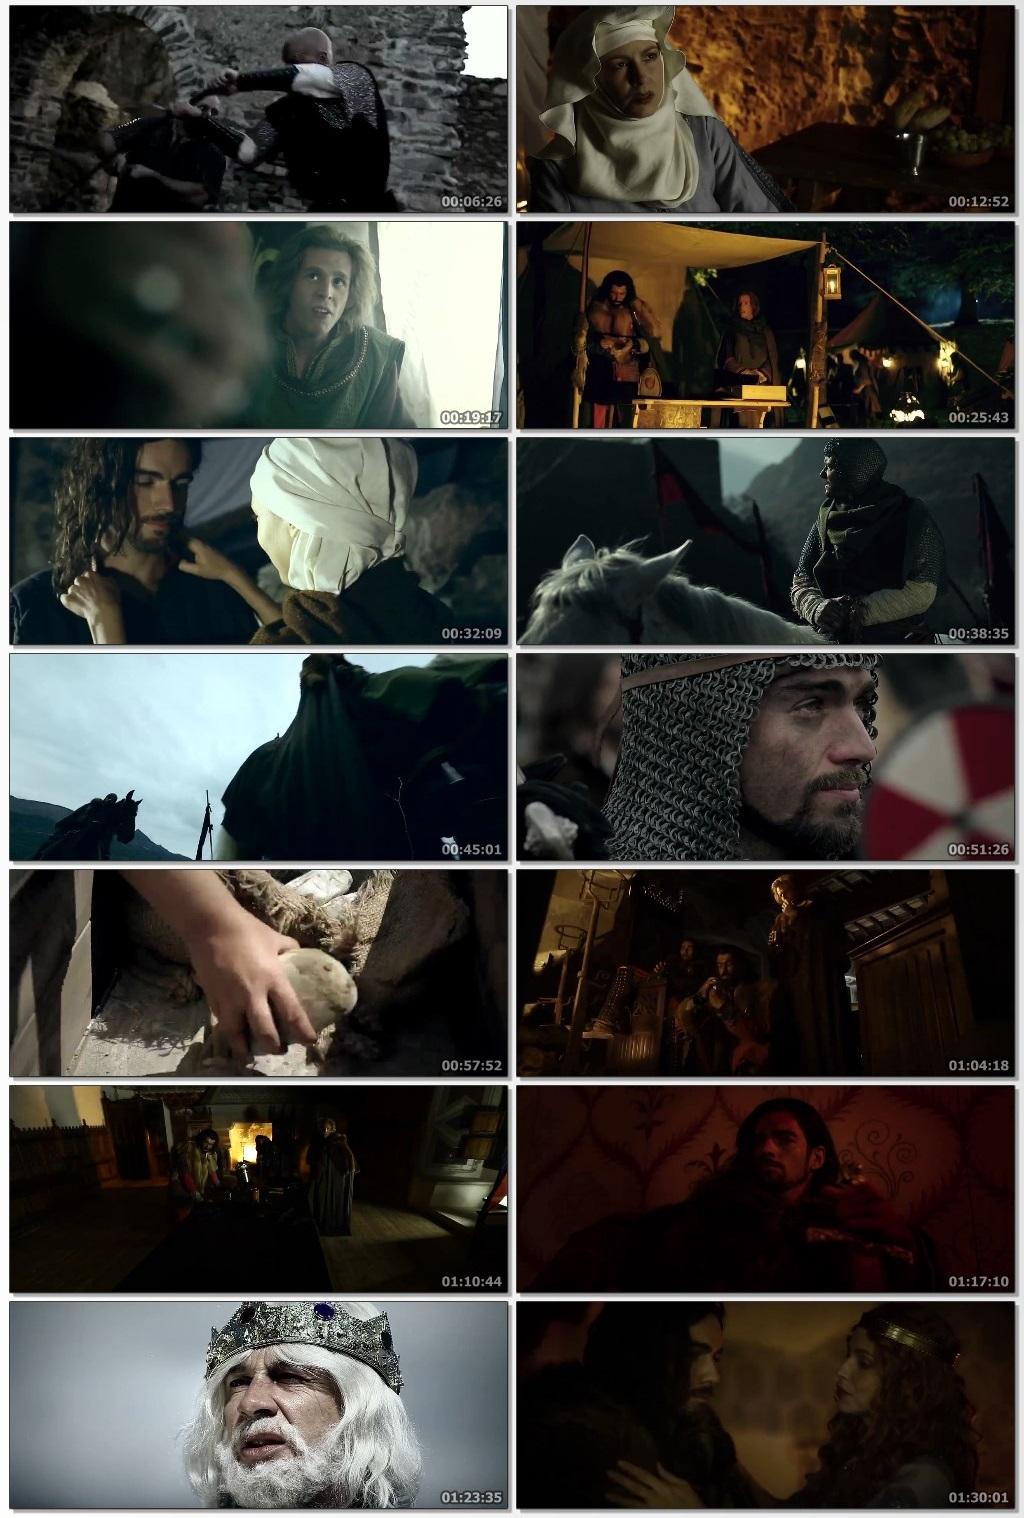 Richard-The-Lionheart-Rebellion-2015-www-9kmovies-blog-Hindi-Dual-Audio-720p-Blu-Ray-ESub-800-MB-mkv